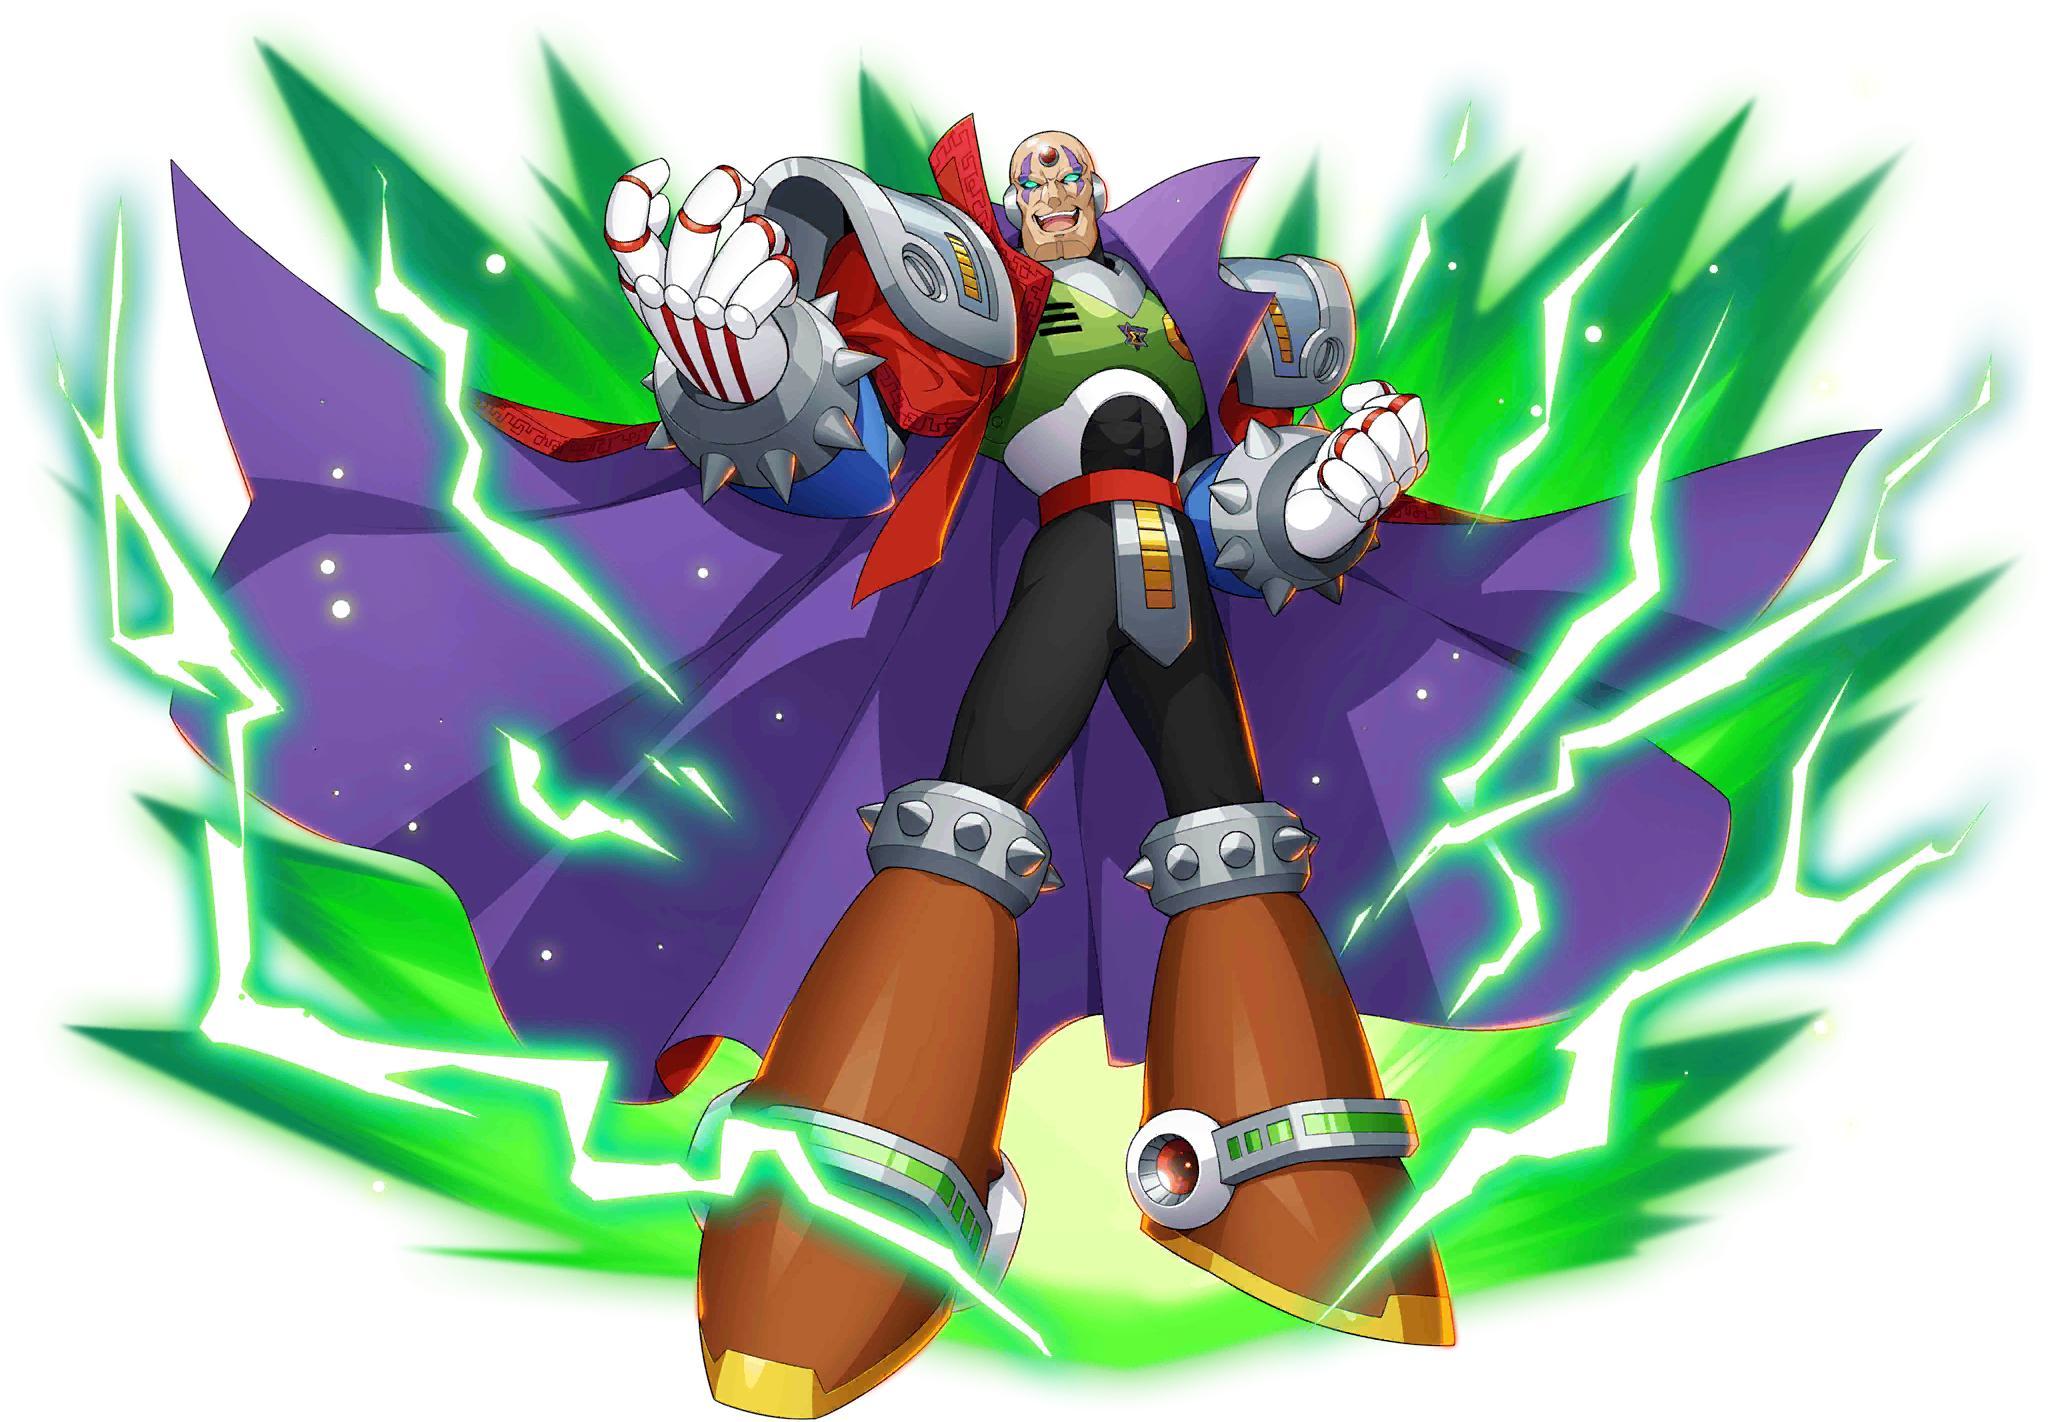 25DQdUx - 『ロックマンX』シリーズ最新アプリ『ロックマンX DiVE』が2020年秋に配信決定!